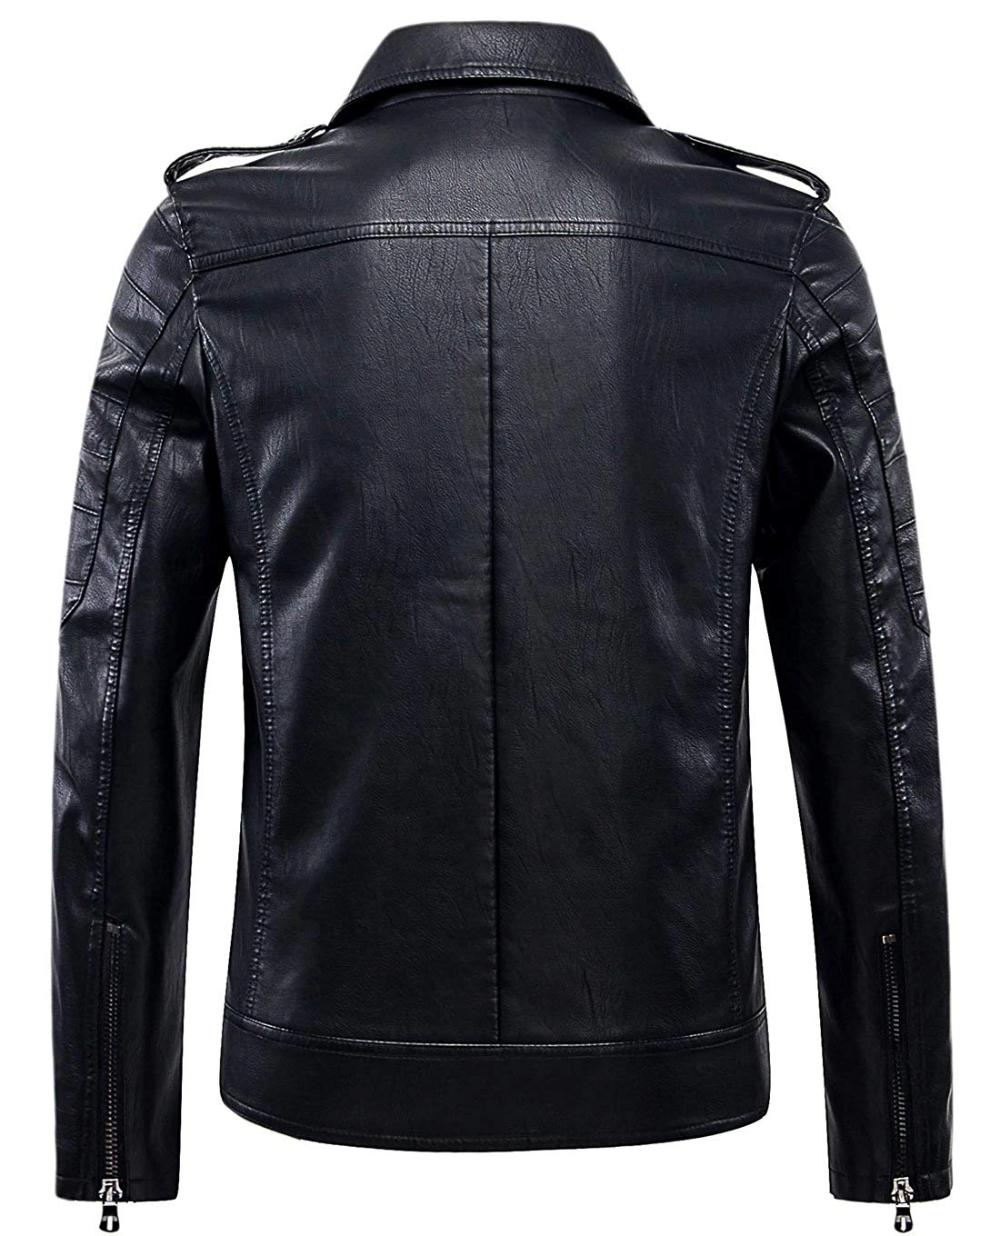 Men S Vintage Asymmetric Zip Lightweight Faux Leather Jacket Leather Jacket Leather Jacket Men Faux Leather Biker Jacket [ 1236 x 1000 Pixel ]